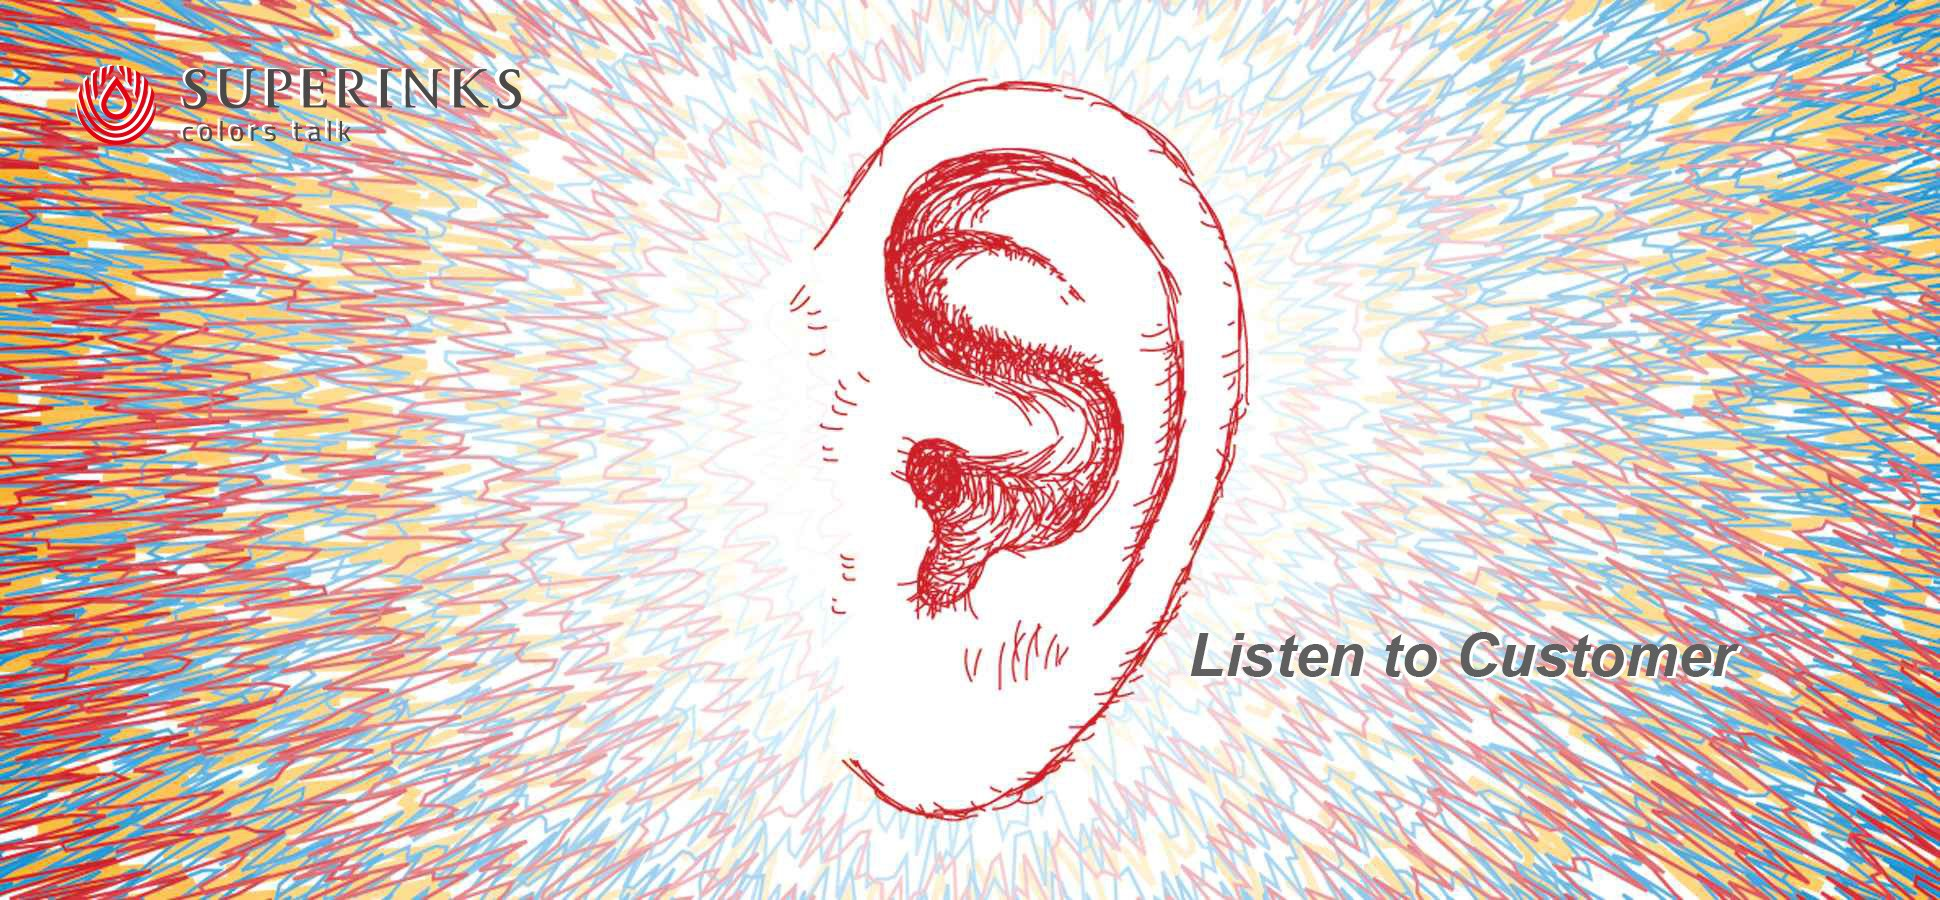 Listen to customer